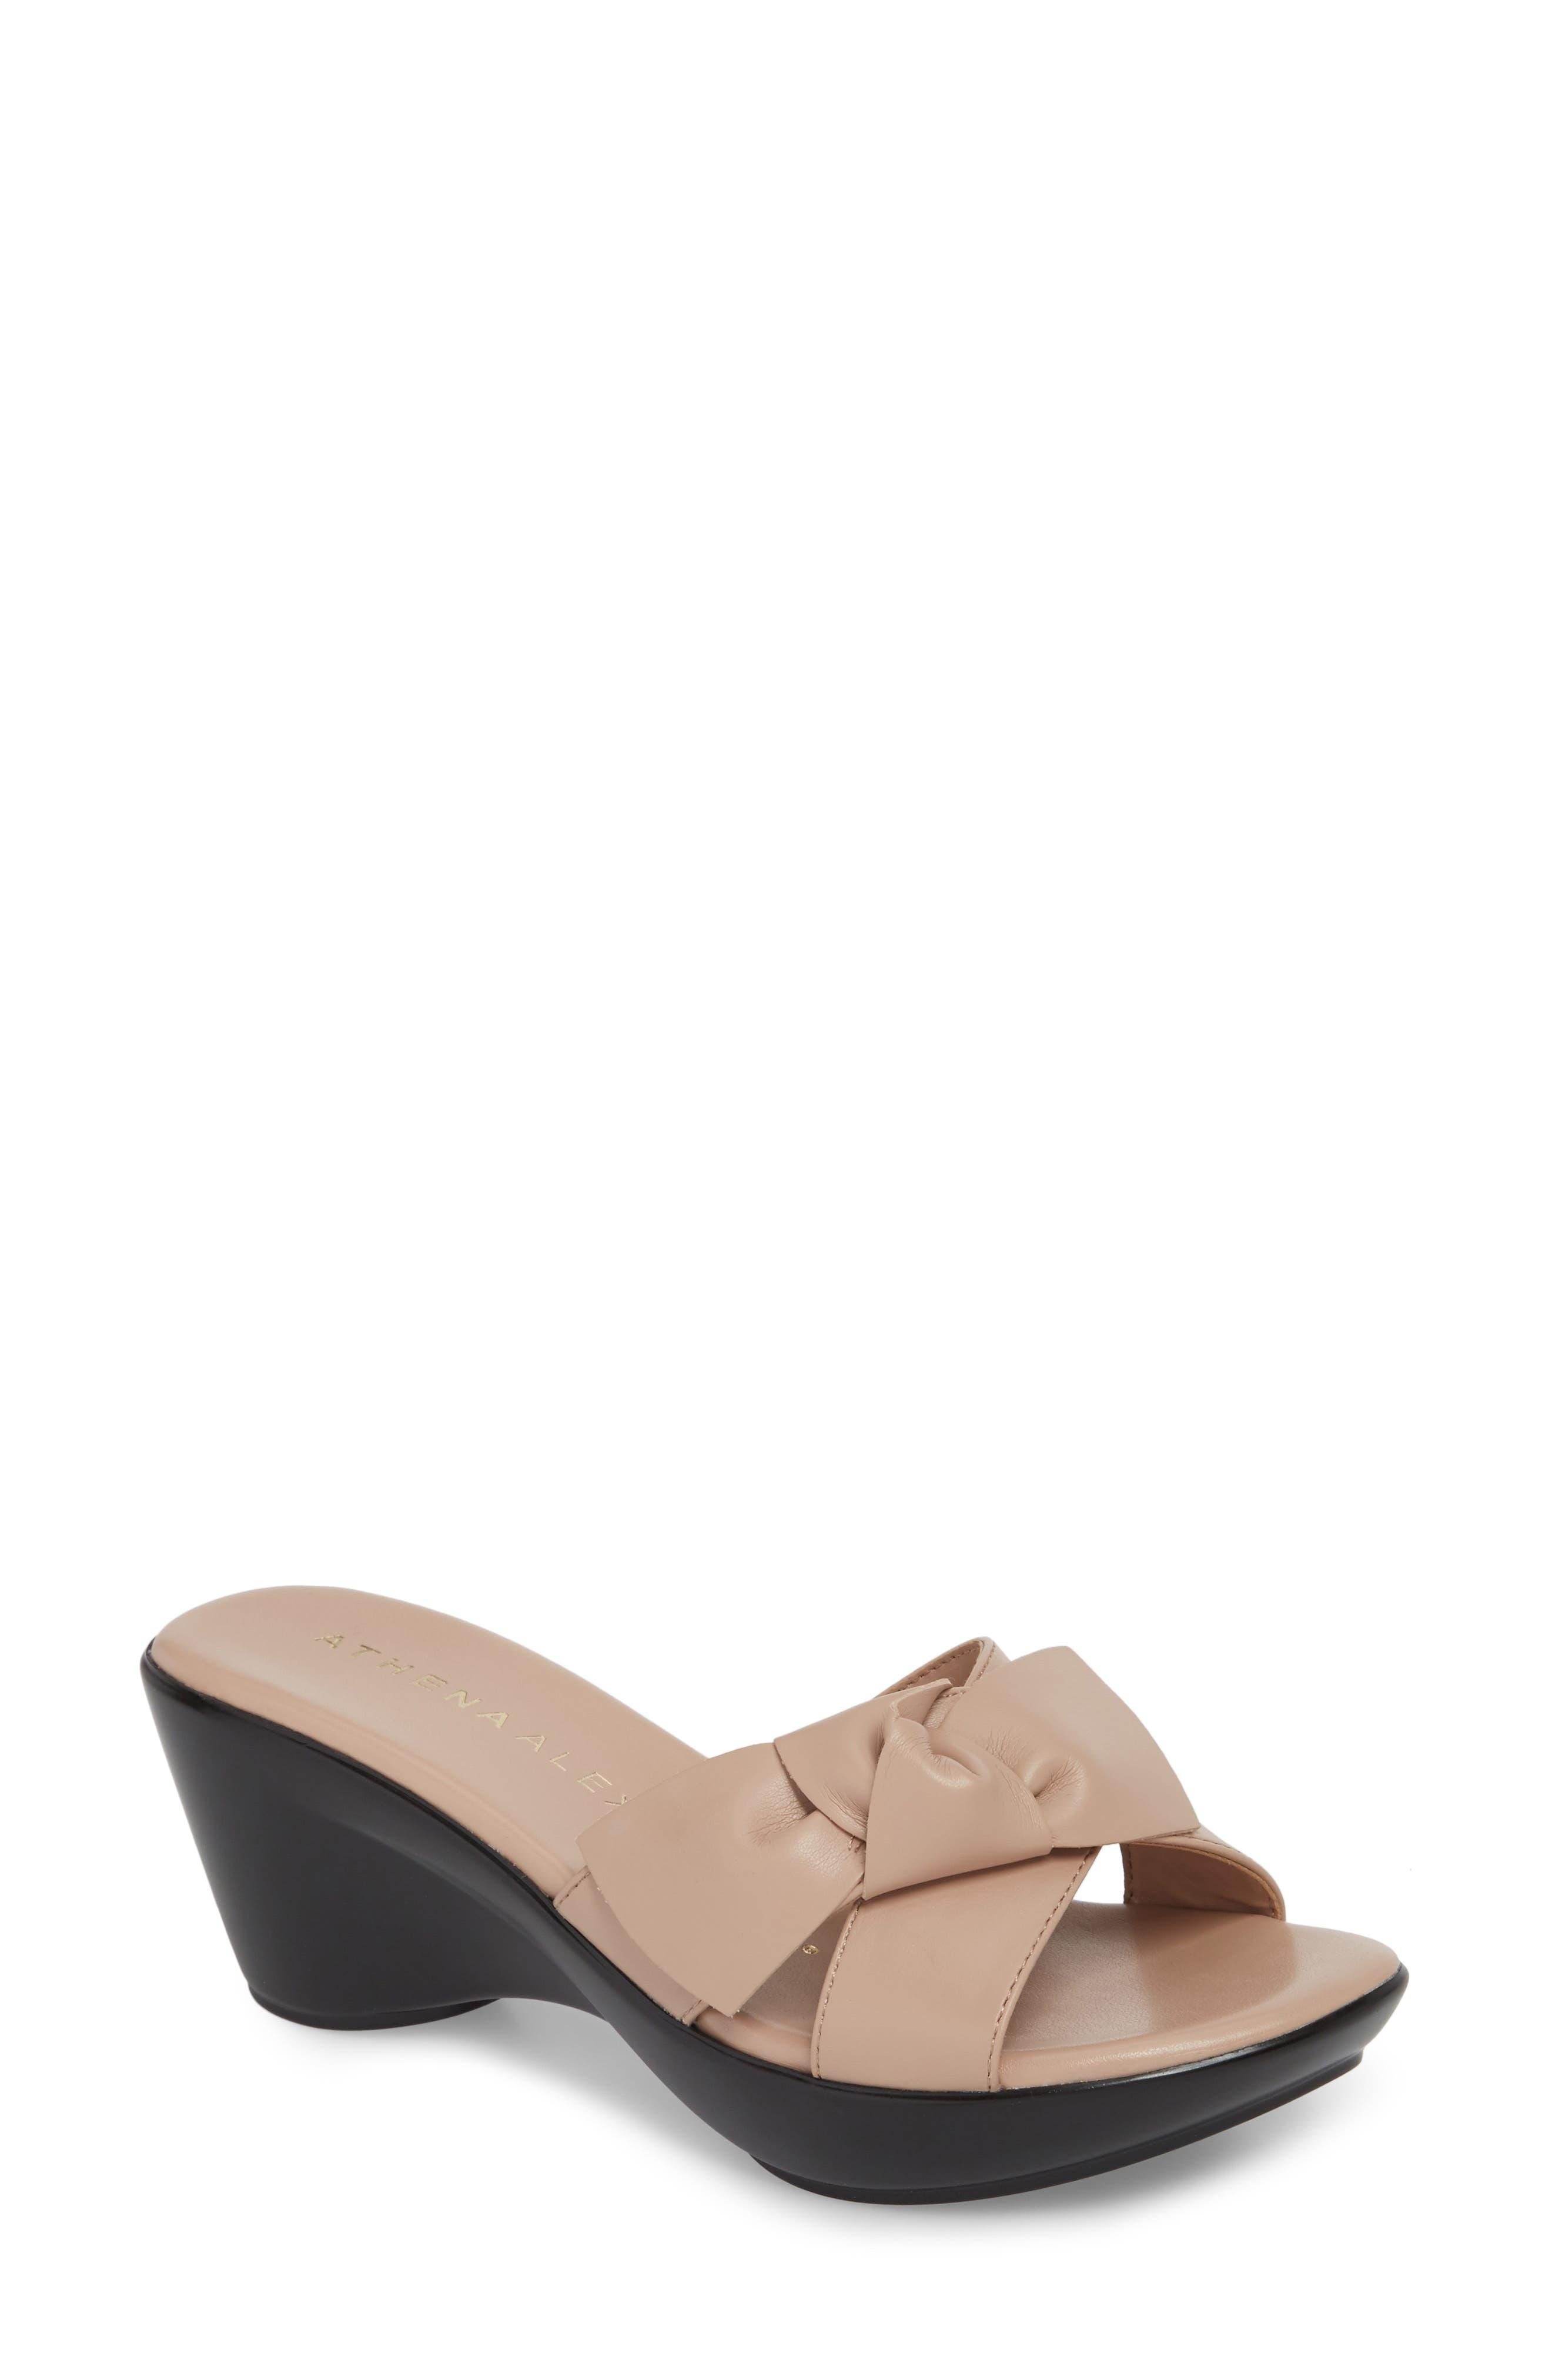 Athena Alexander Giada Wedge Sandal (Women)